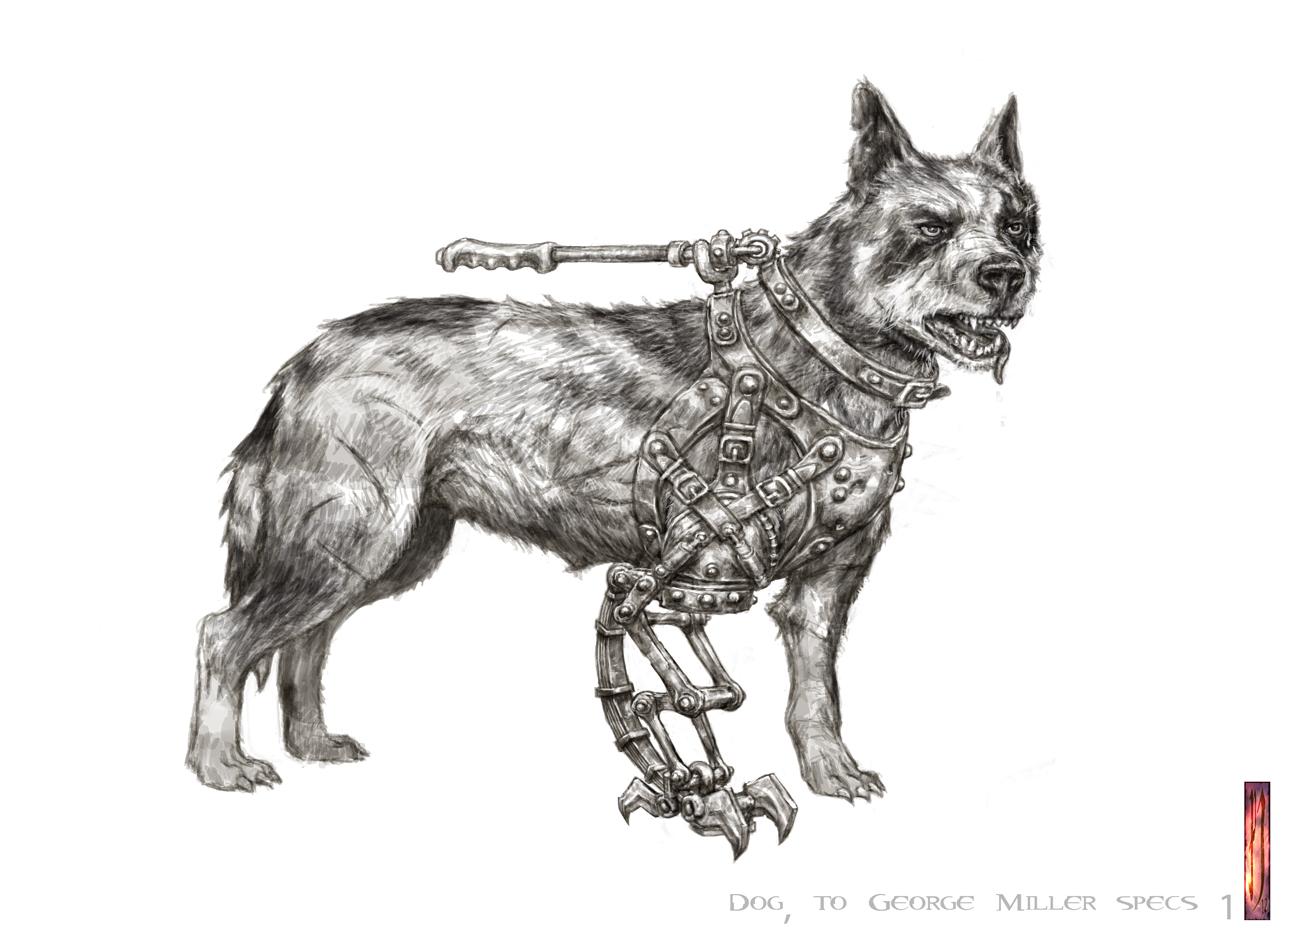 Dog version 4